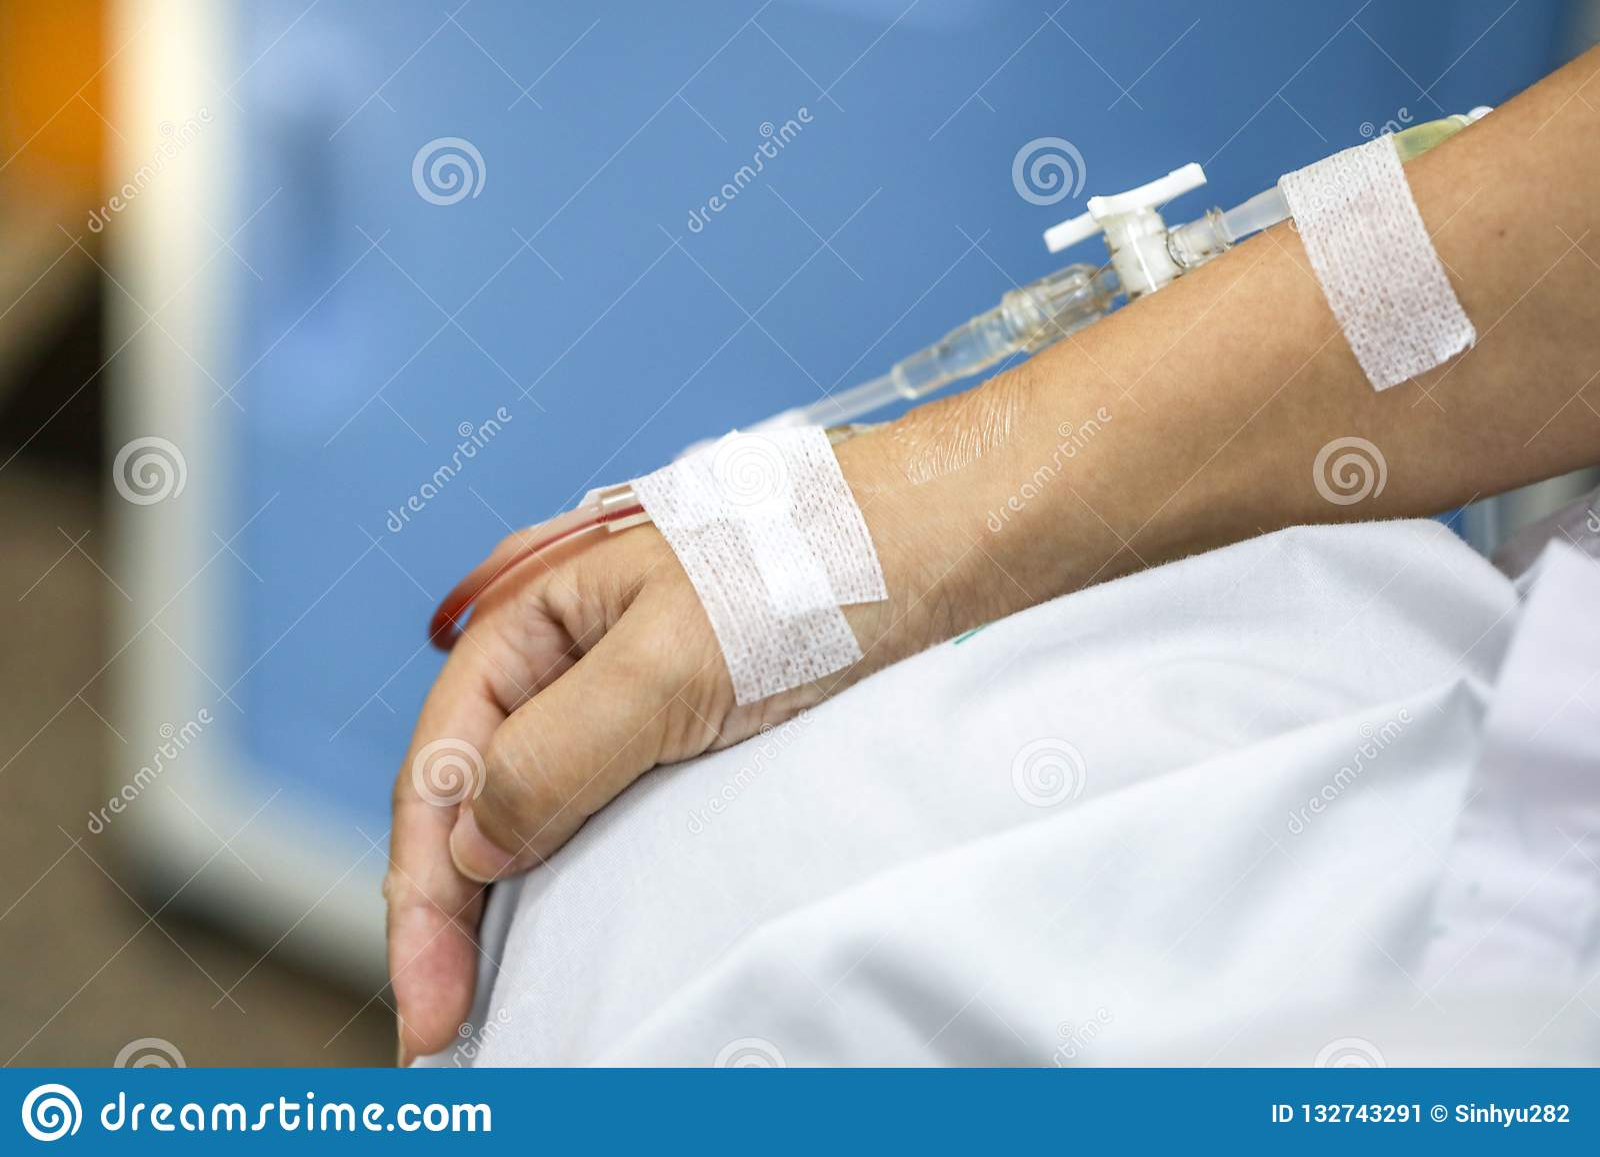 woman Saline injection bondage